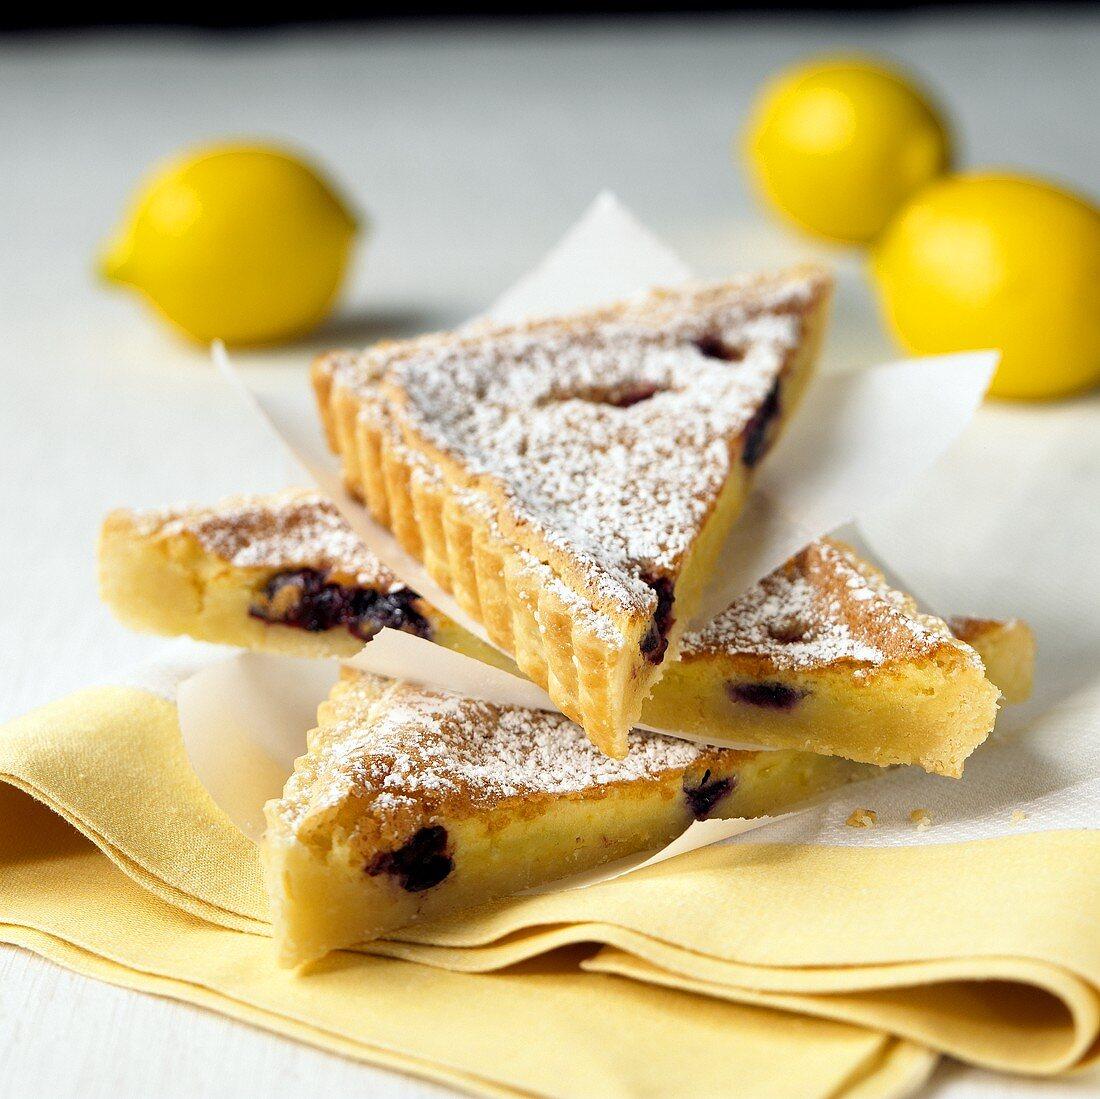 Lemon and blueberry tart cut into triangular pieces